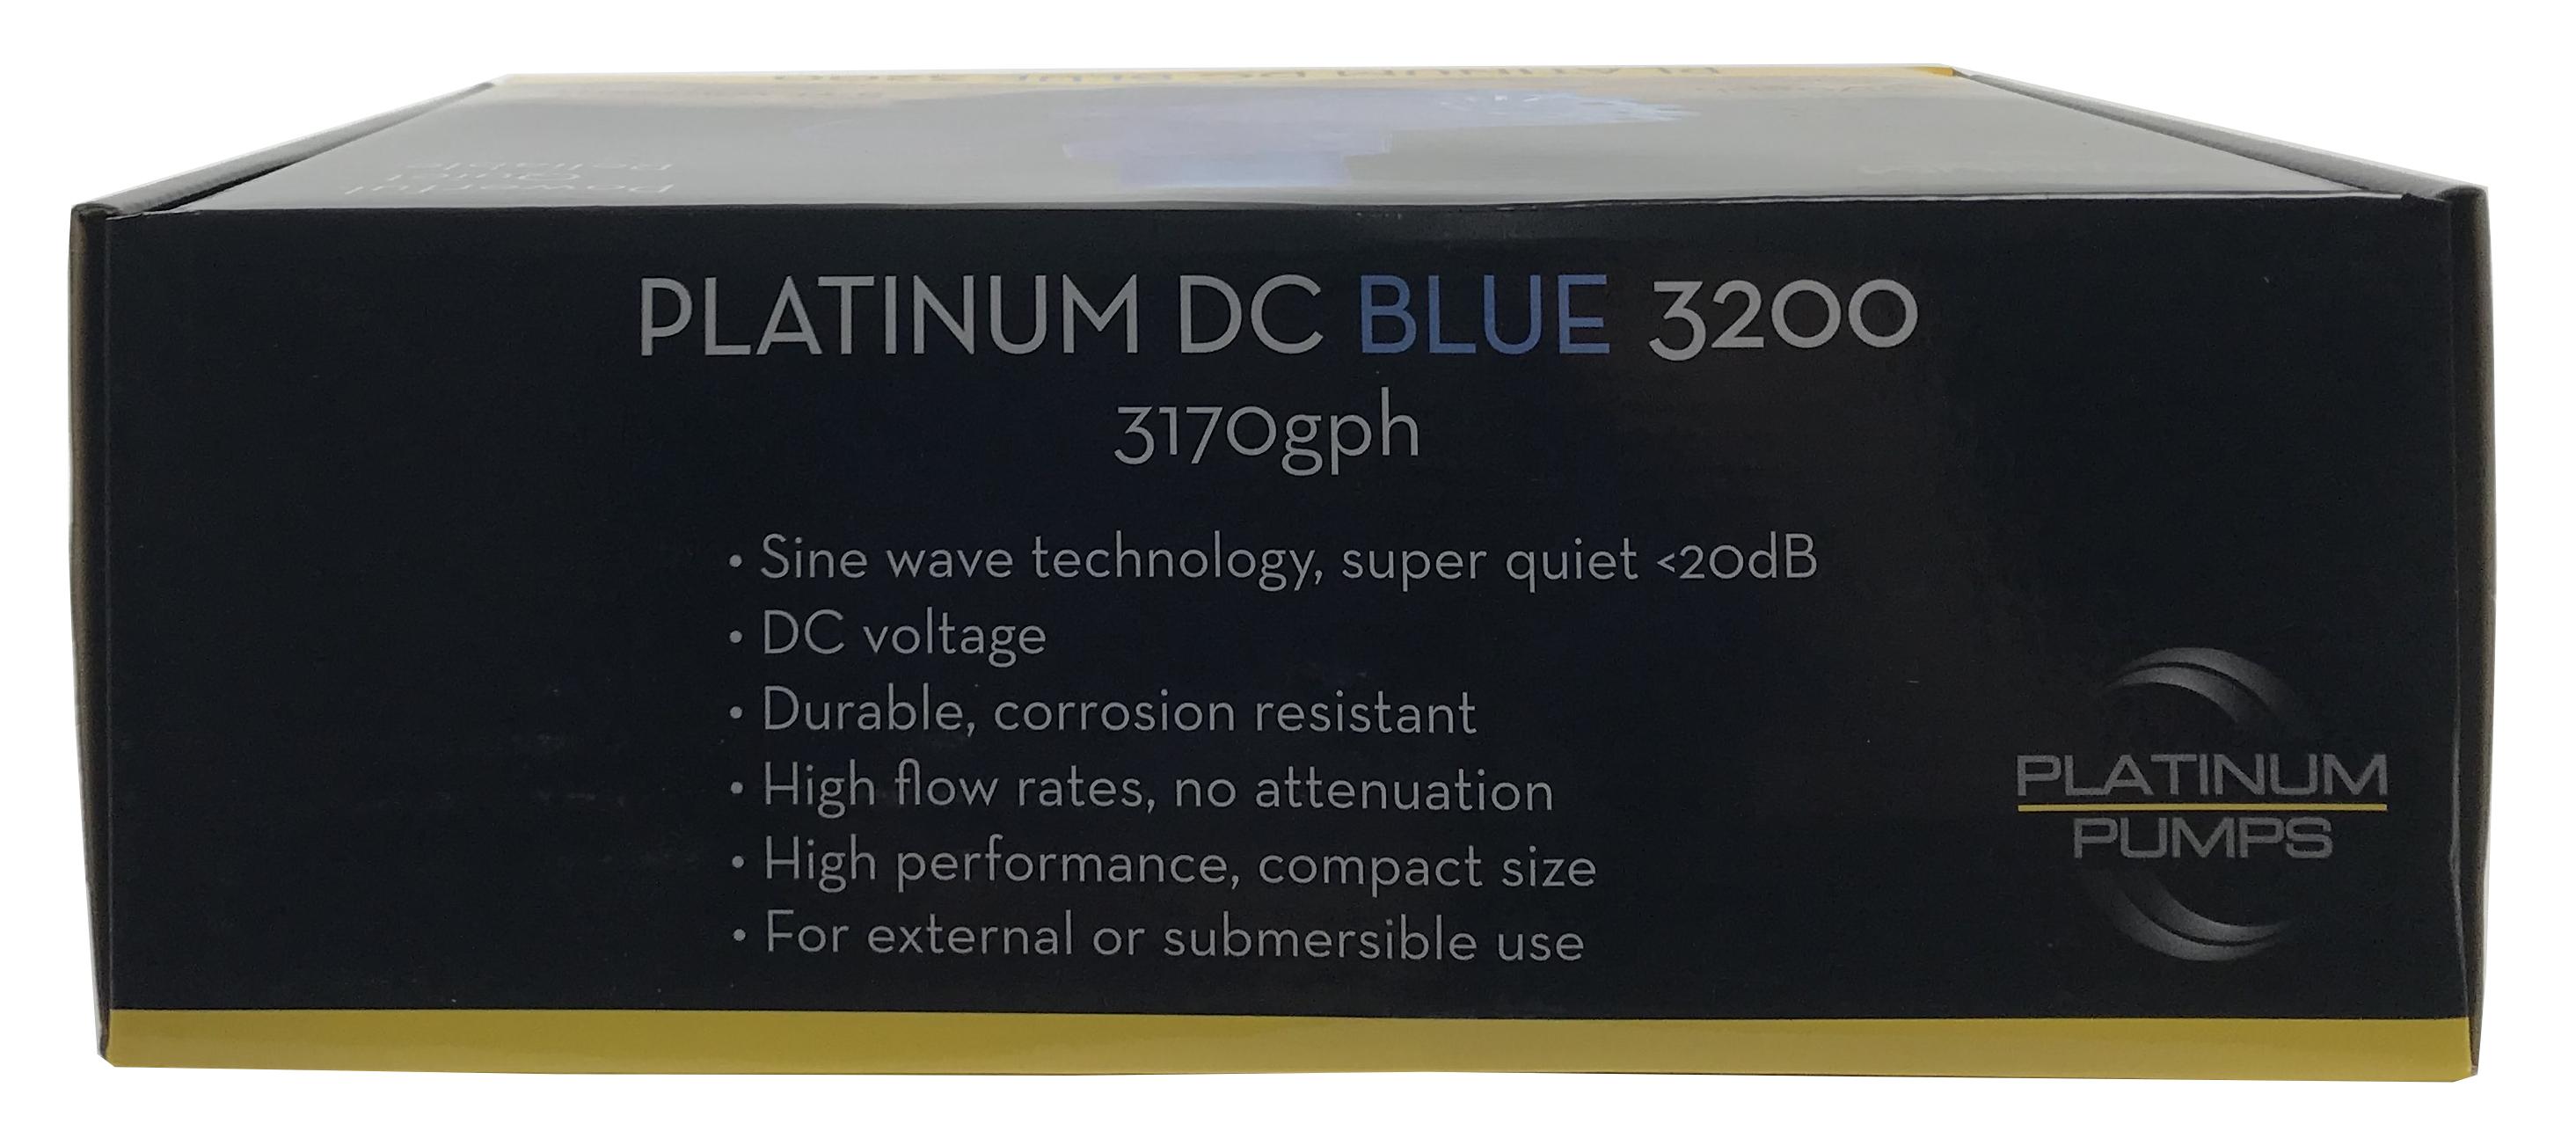 Platinum DC Blue 3200 Pump - 3170 gph